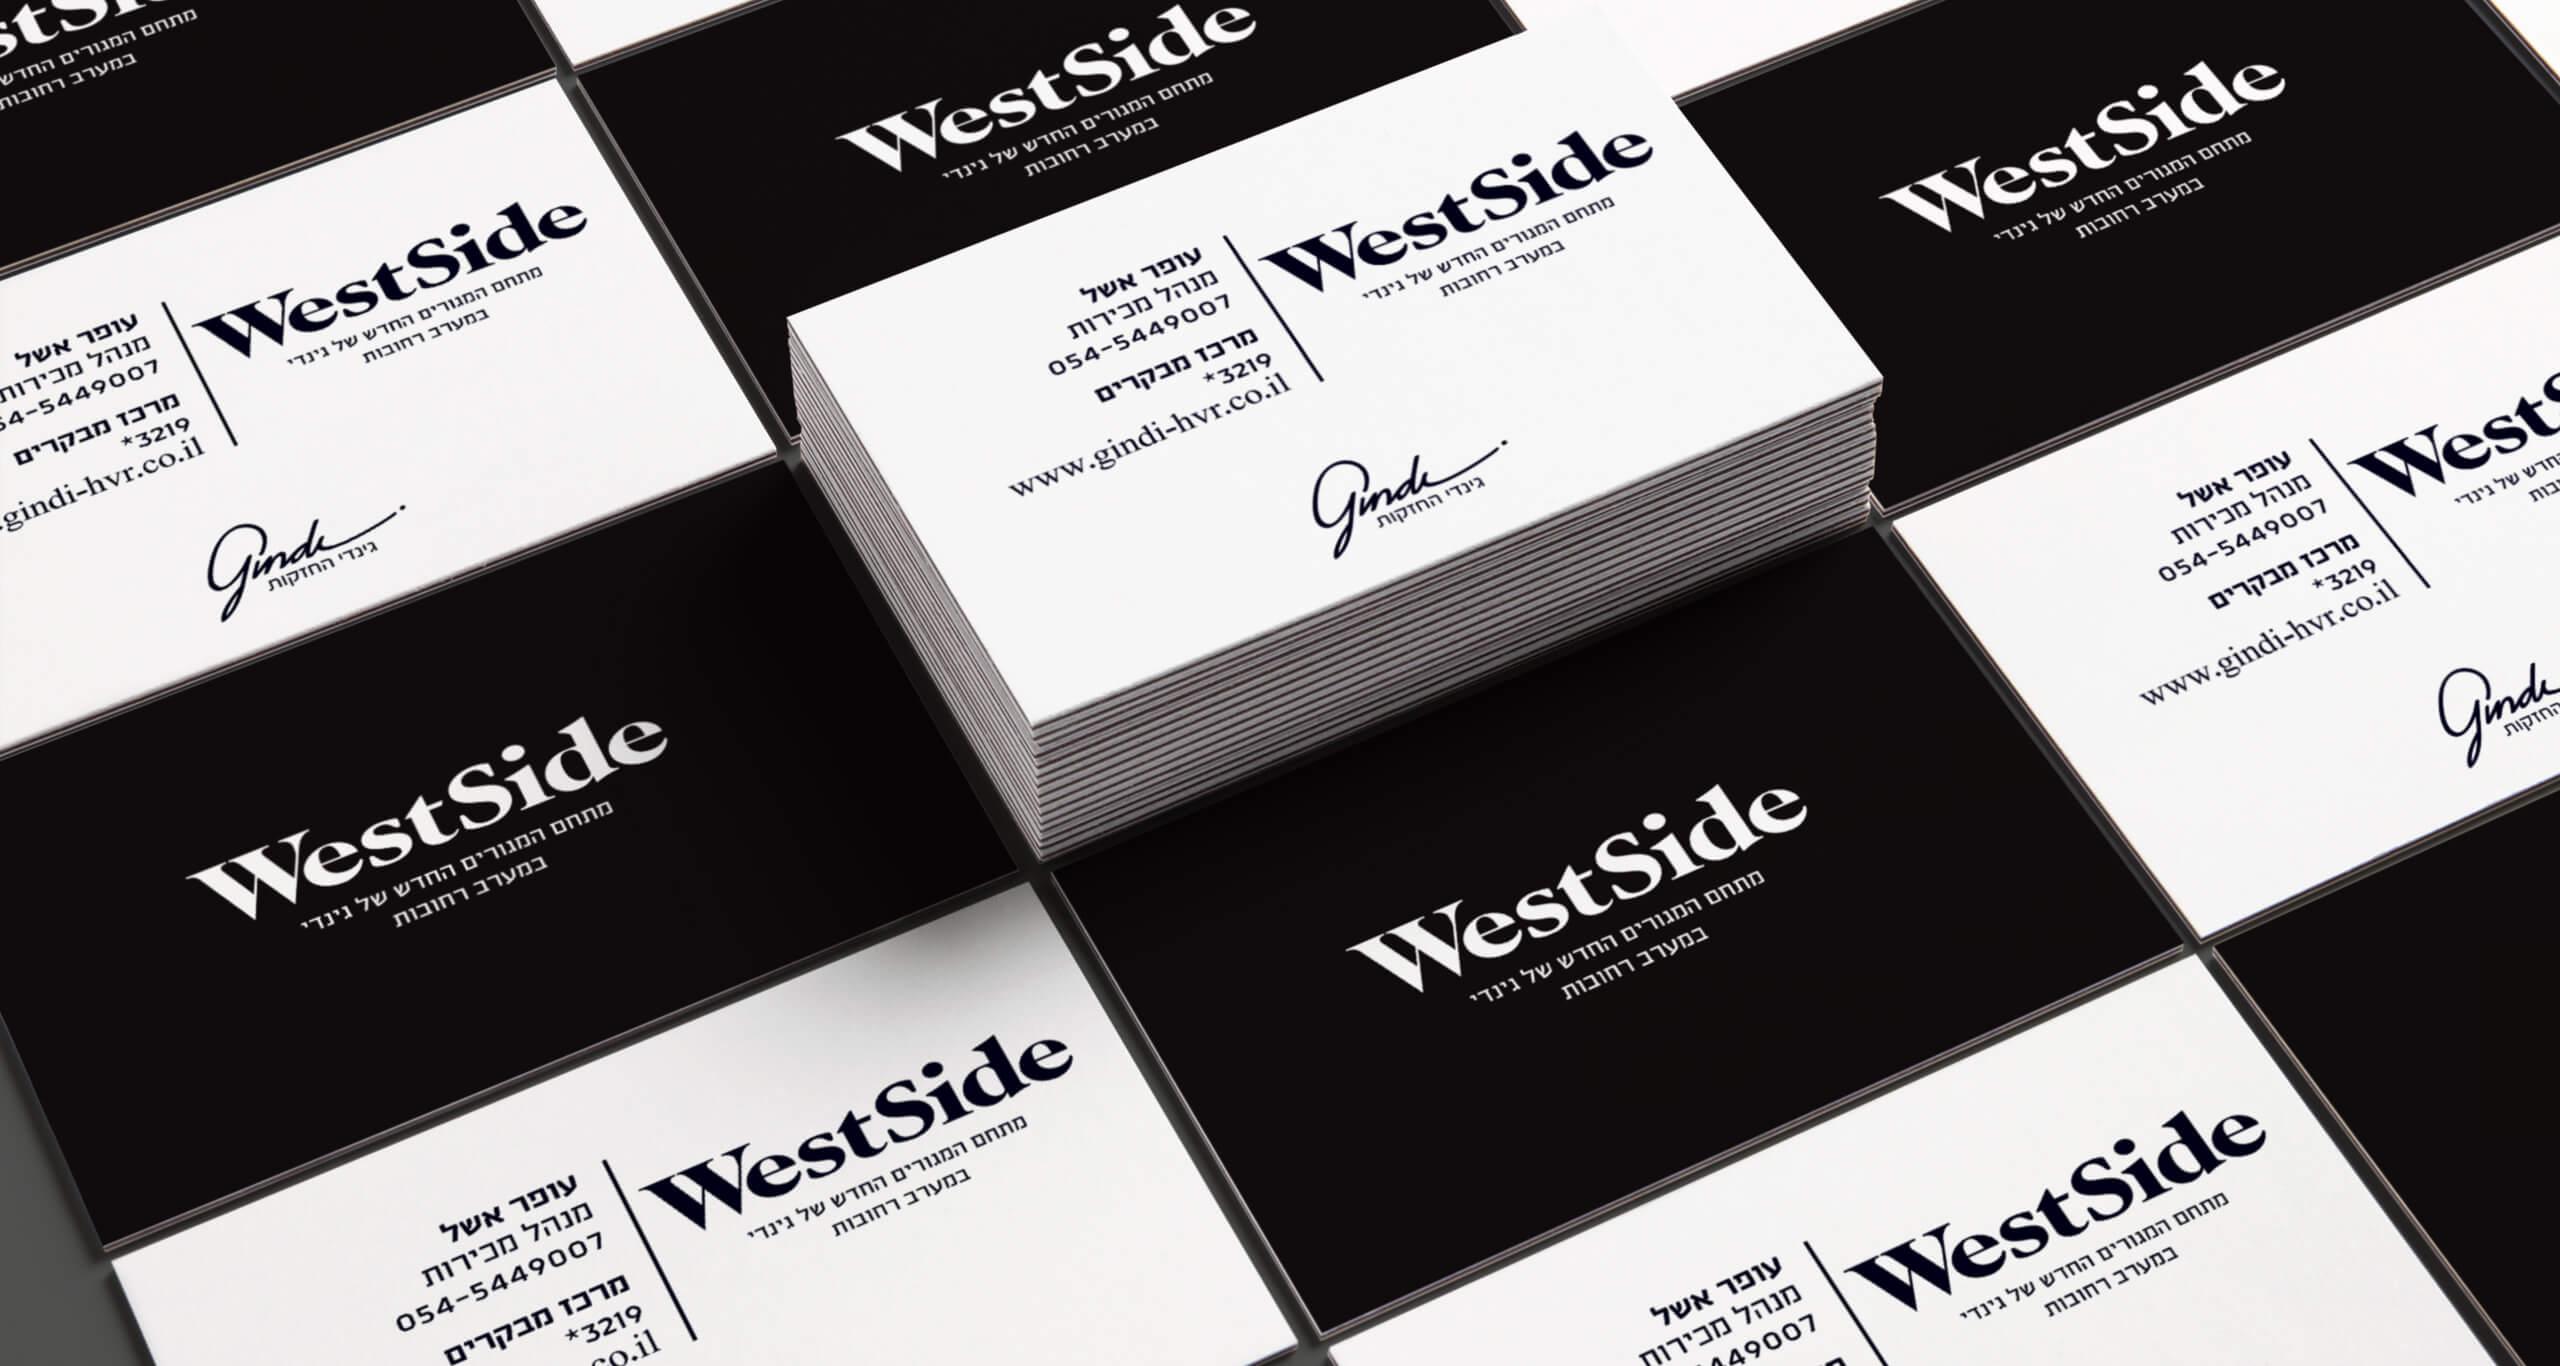 westside_2560x1366_5